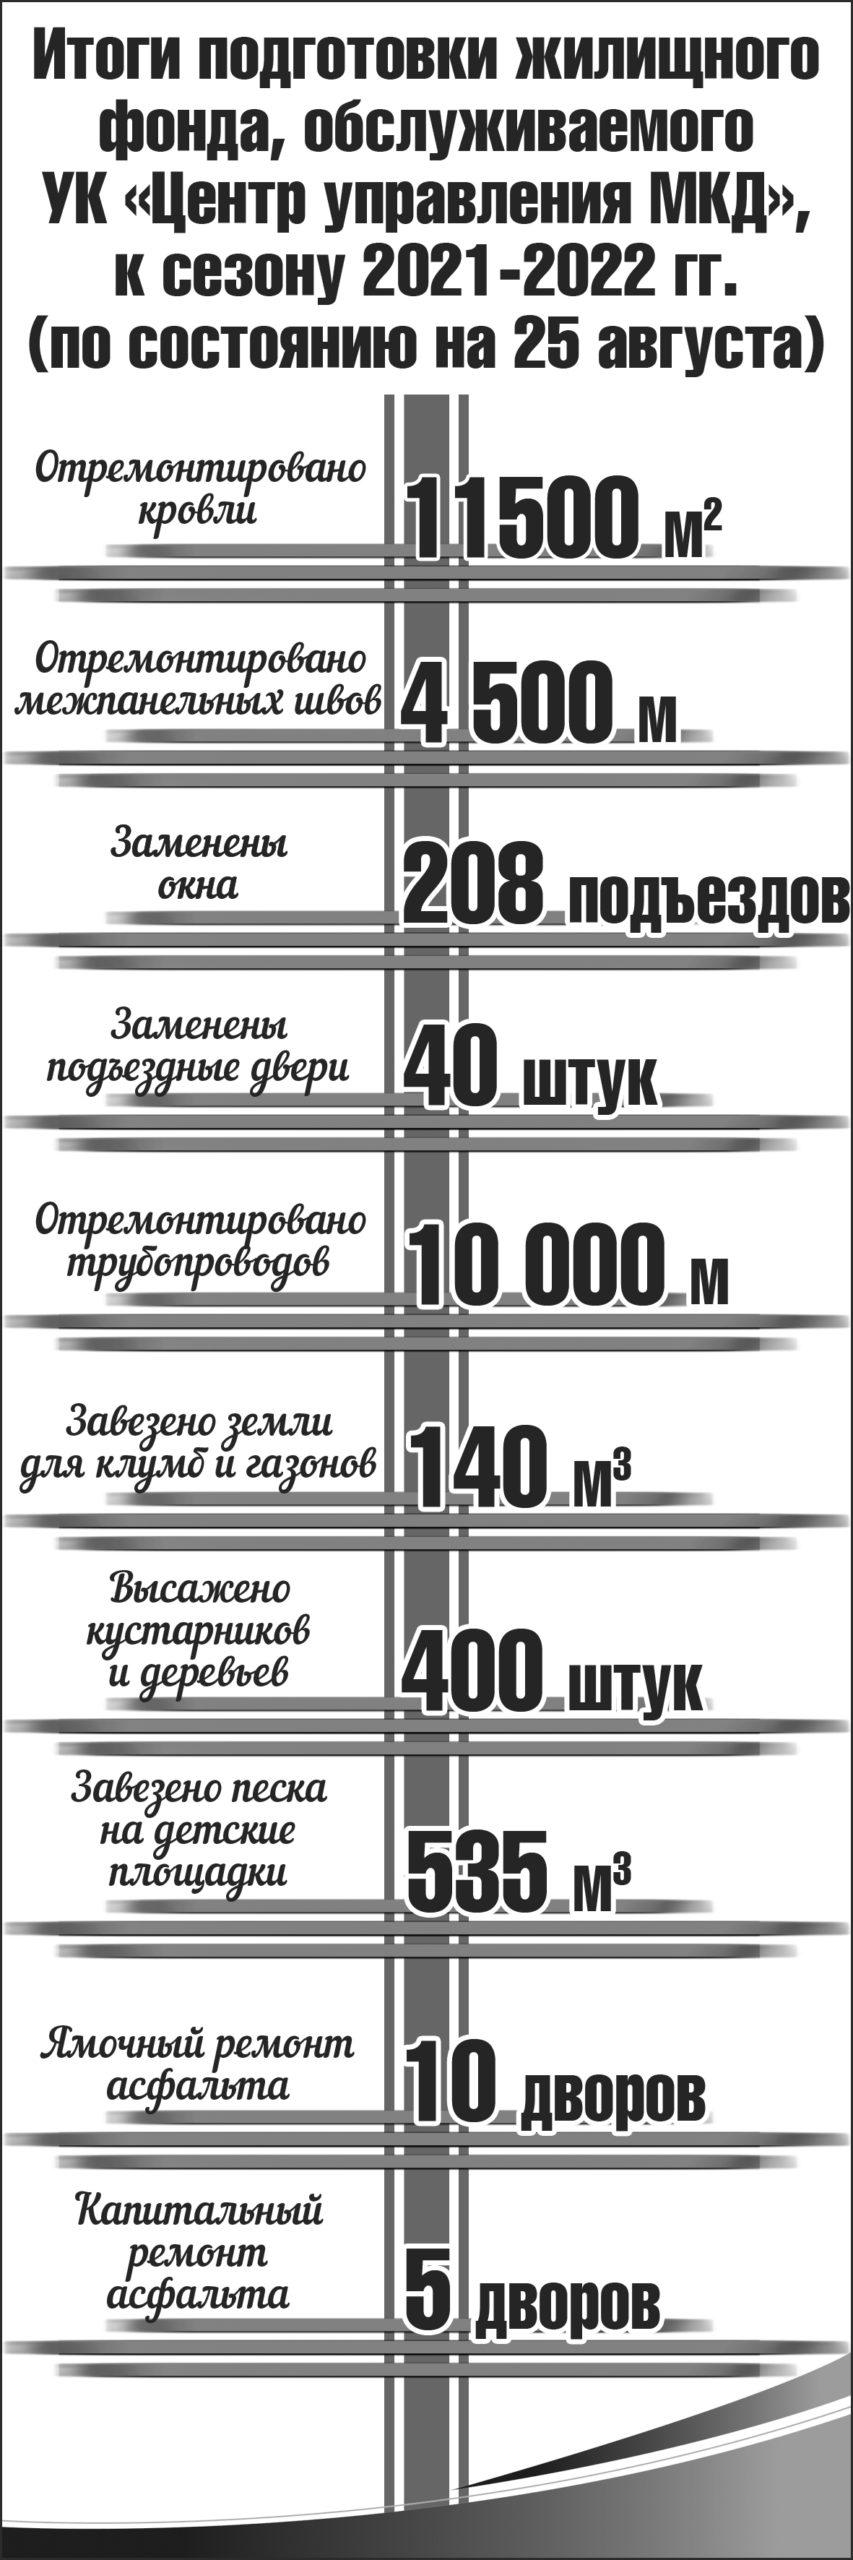 Инфографика МКД